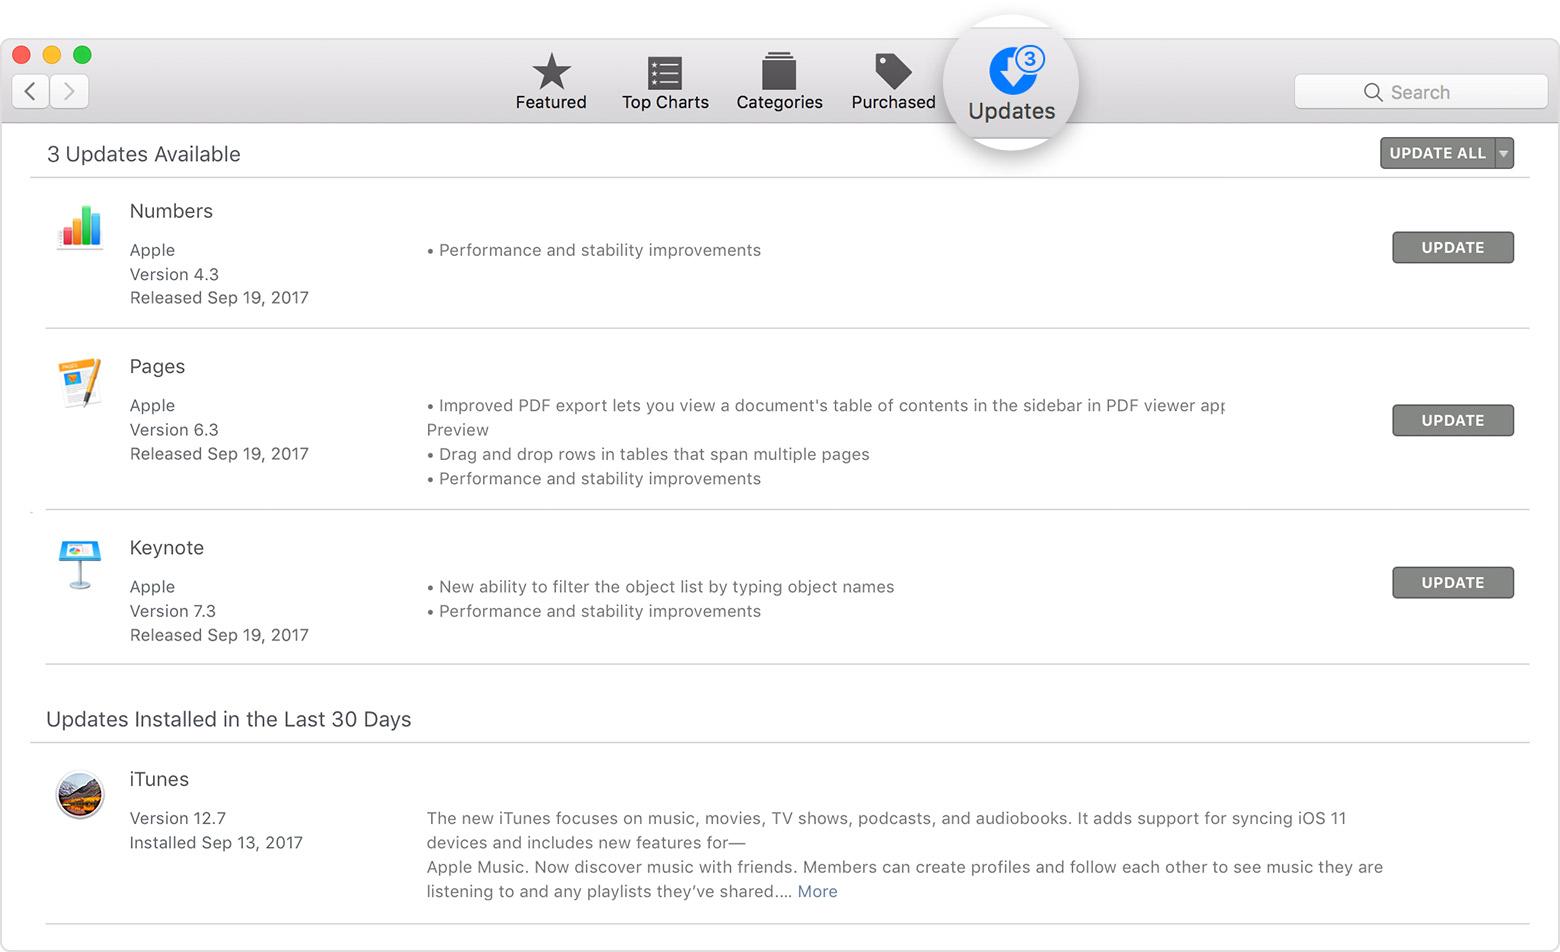 Fix iTunes Error 3014 - Image Credit: https://suppo32rt.apple.com/en-us/HT201541